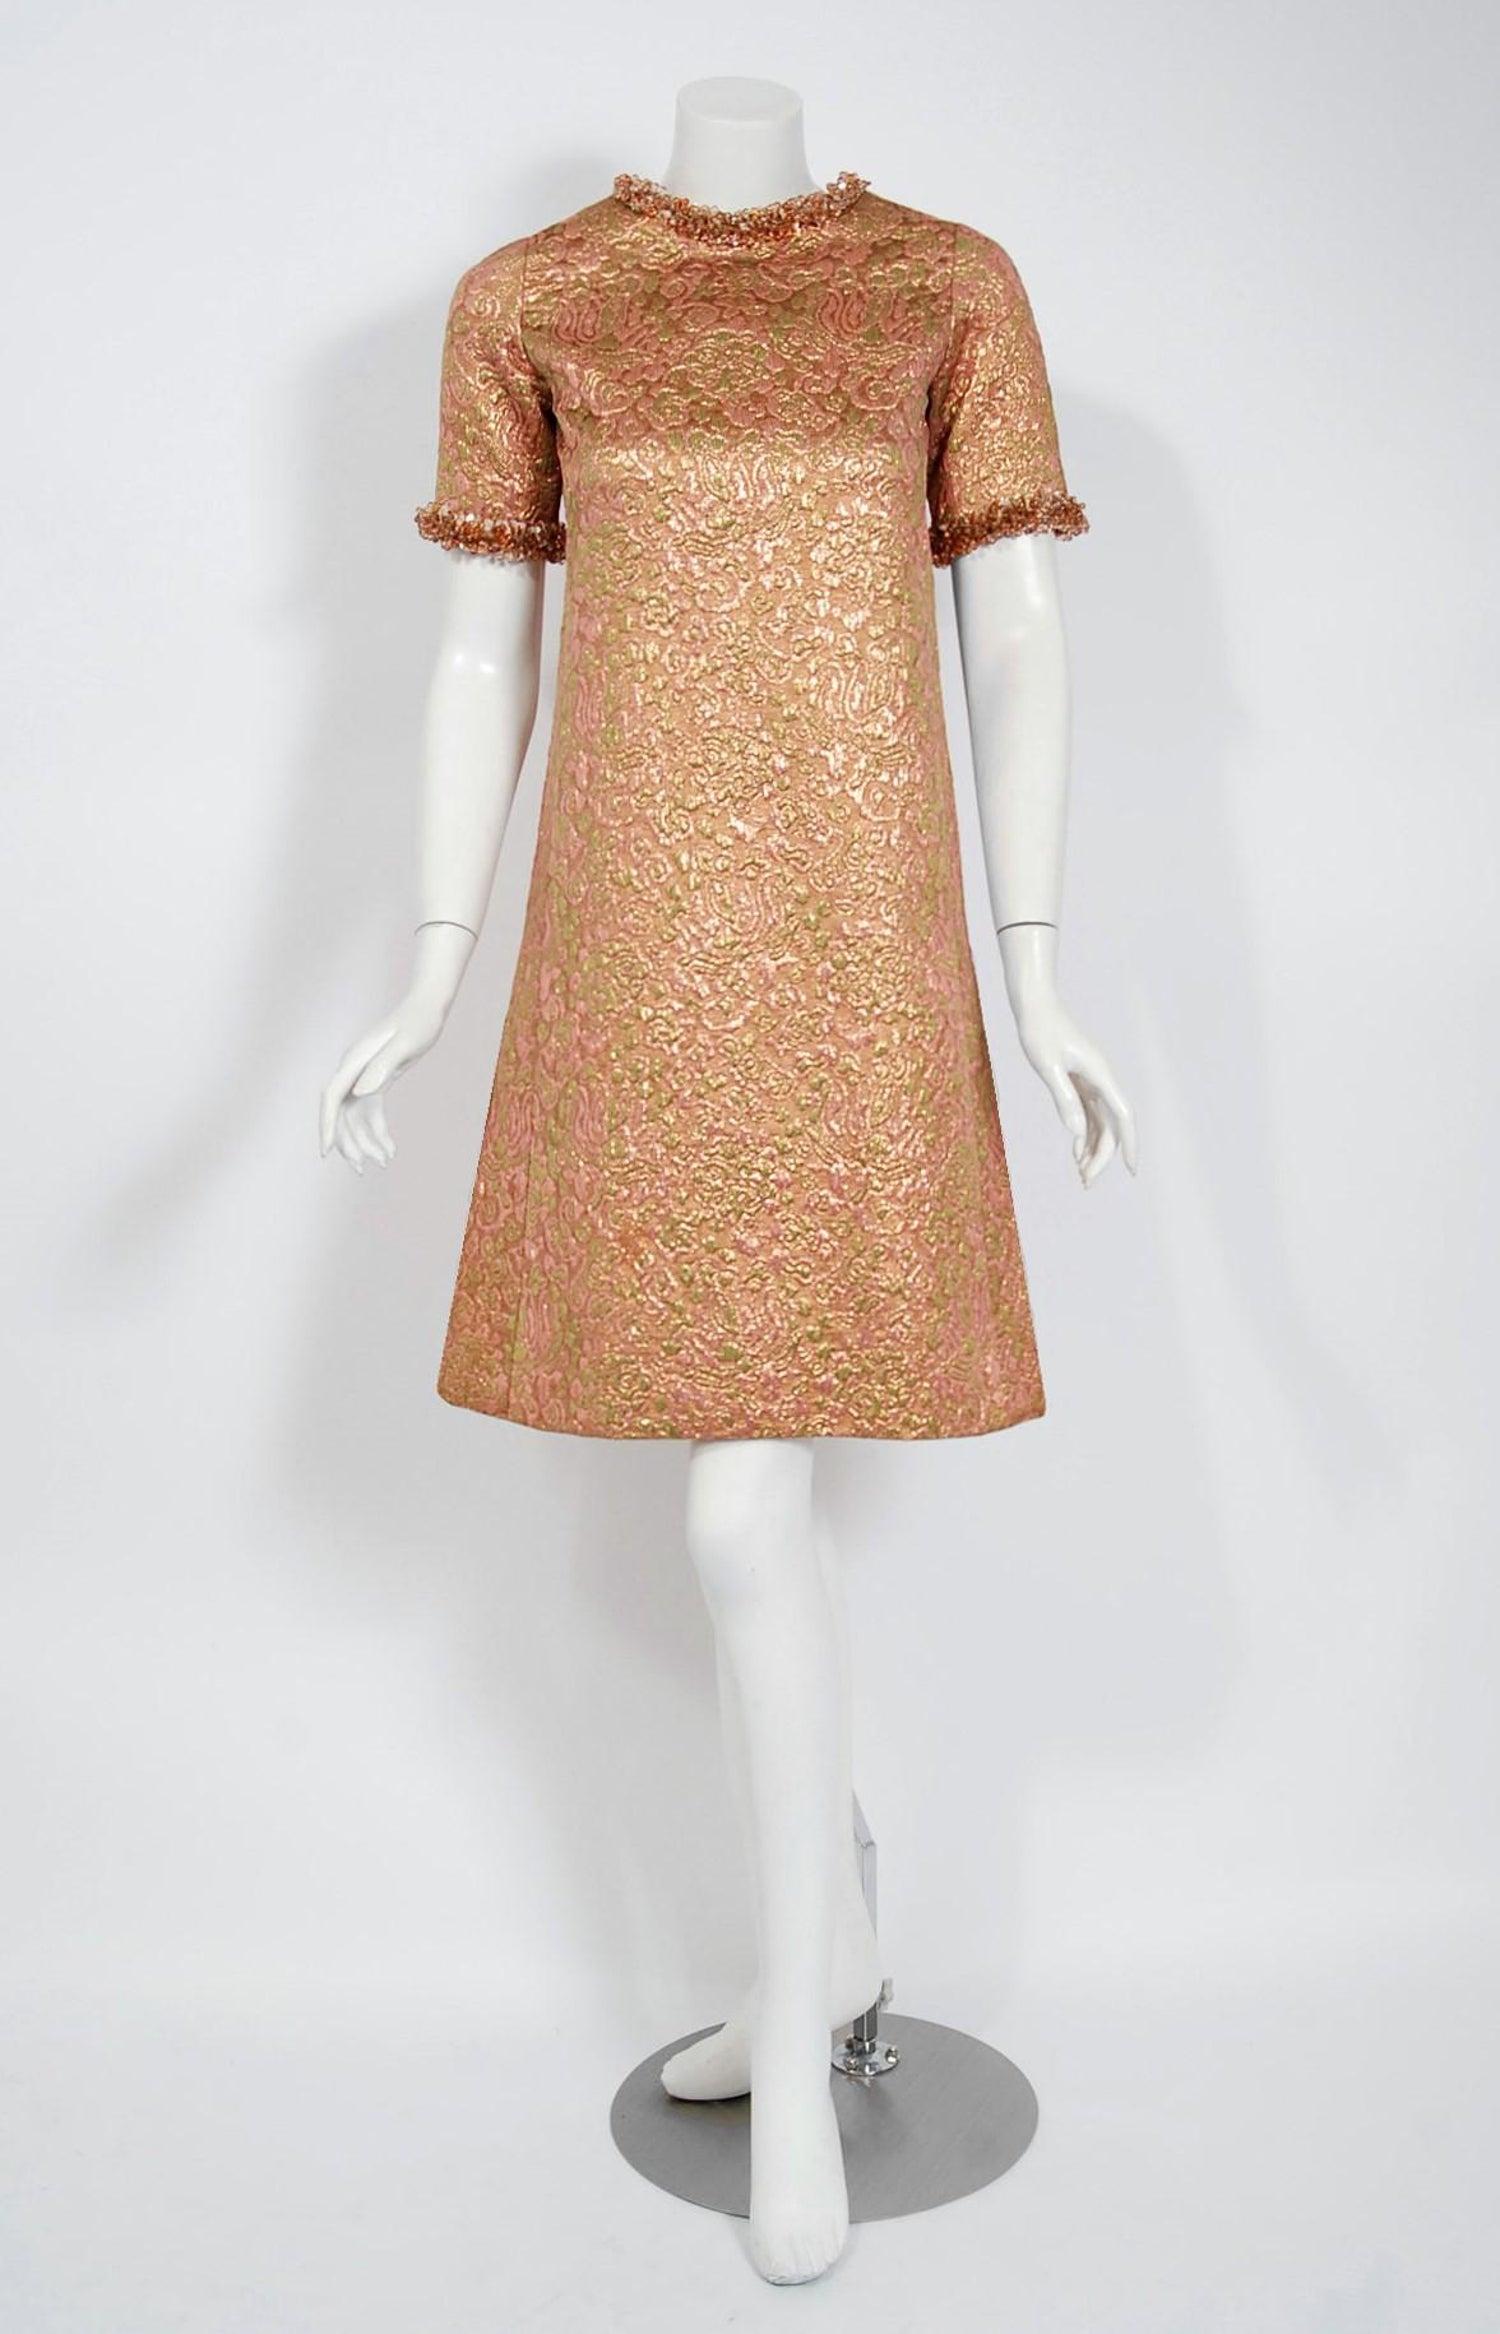 fe759d17a63 1966 Yves Saint Laurent Paris Beaded Metallic Pink Gold Brocade Cocktail  Dress For Sale at 1stdibs